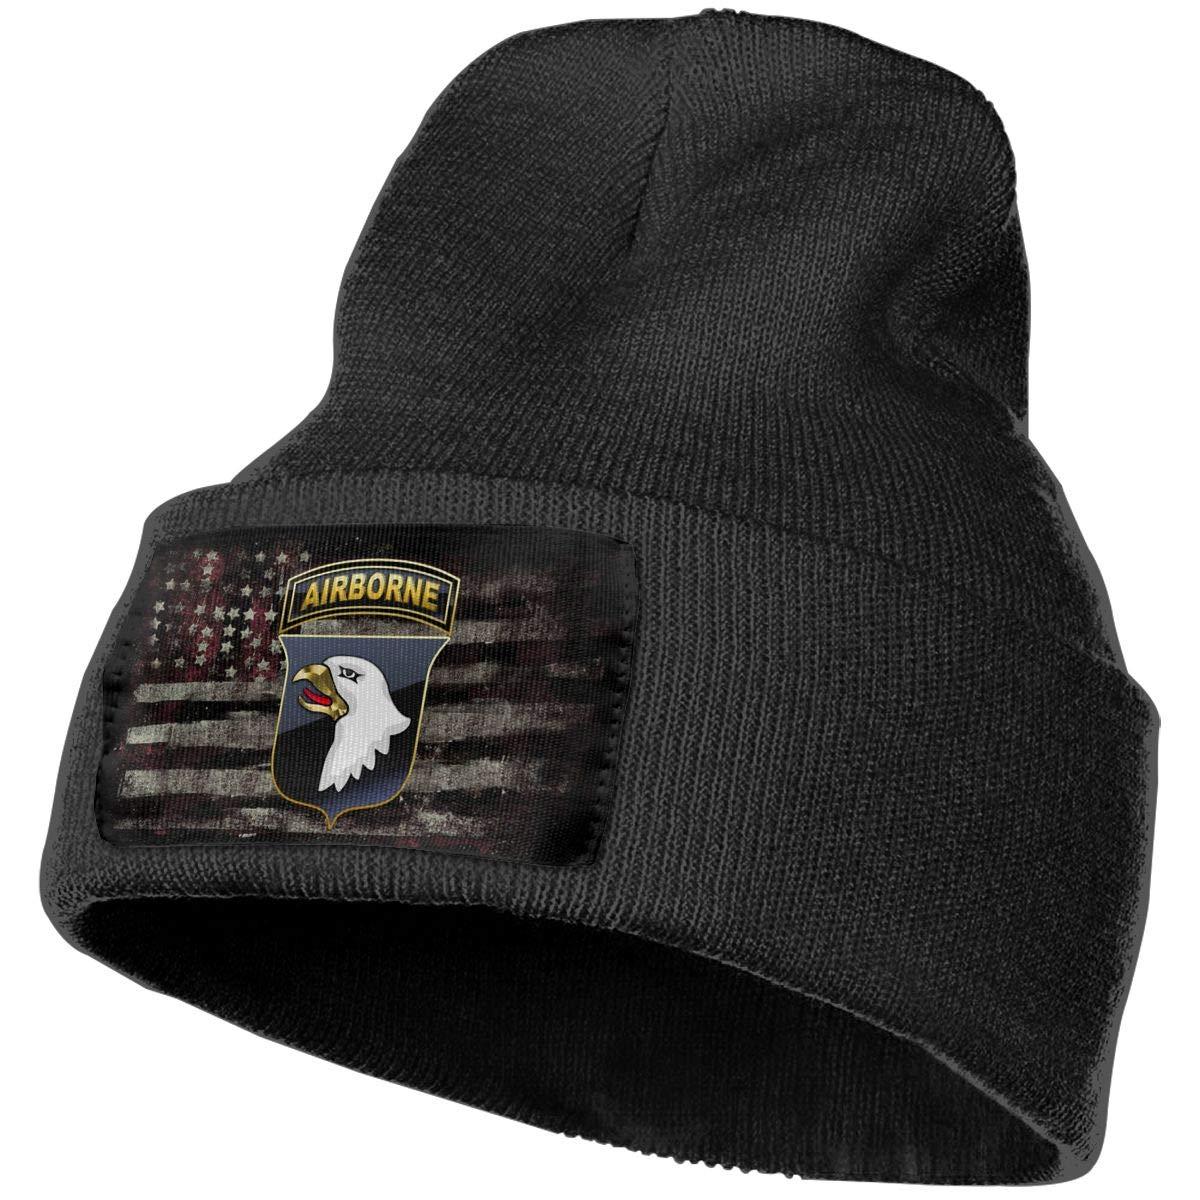 FORDSAN CP 101 Airborne Division Insignia2 Mens Beanie Cap Skull Cap Winter Warm Knitting Hats.